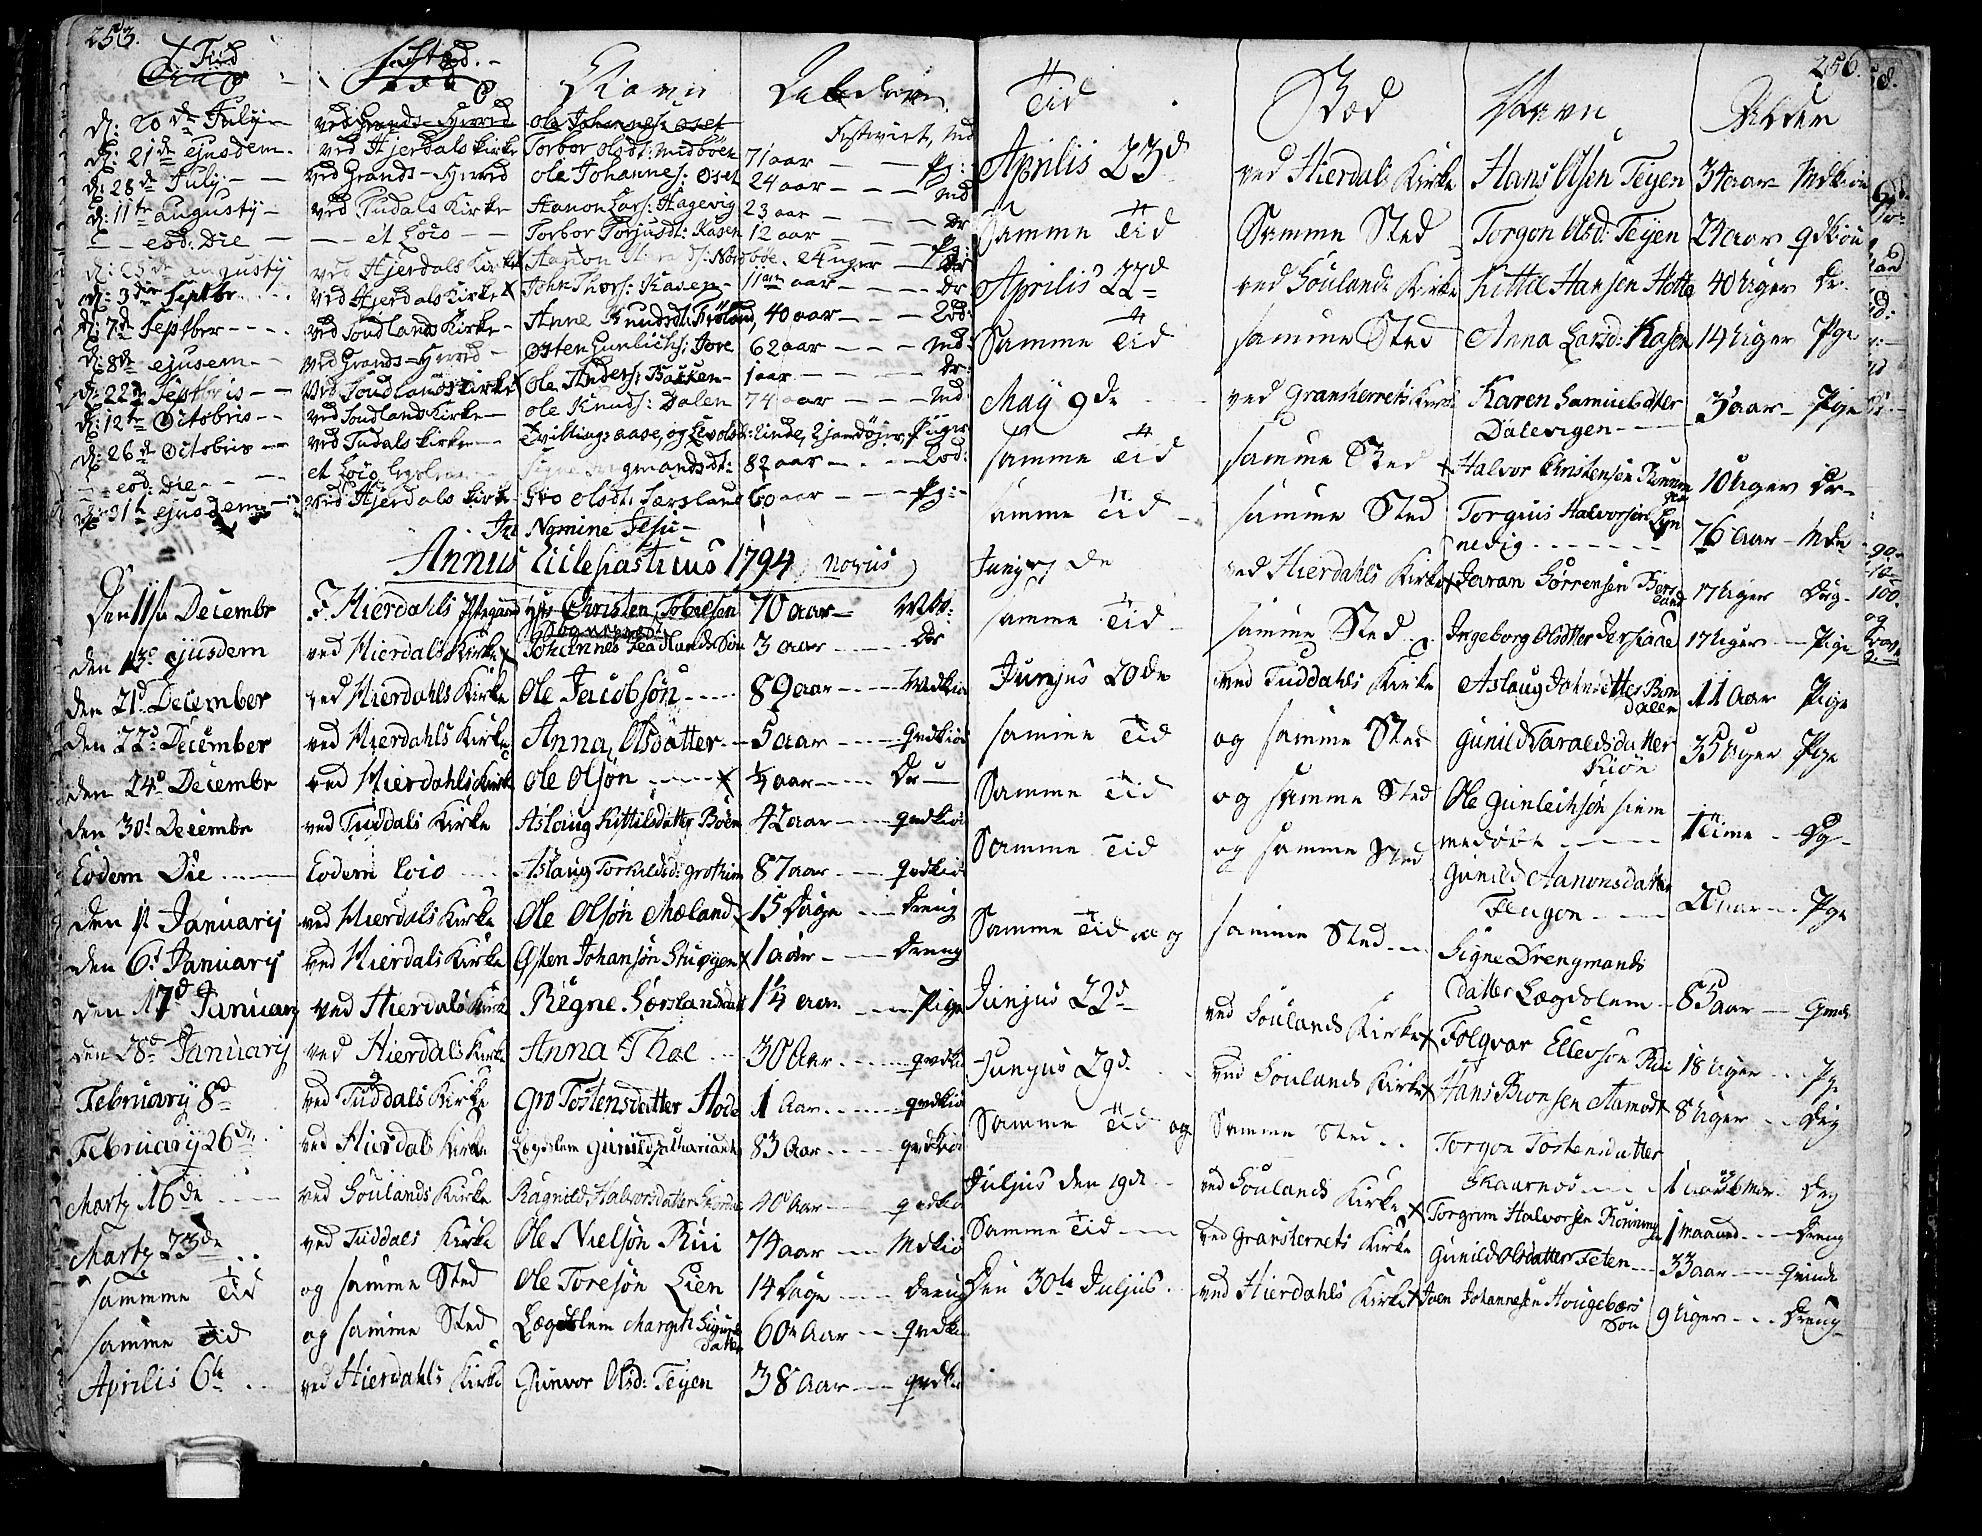 SAKO, Hjartdal kirkebøker, F/Fa/L0005: Ministerialbok nr. I 5, 1776-1801, s. 253-254